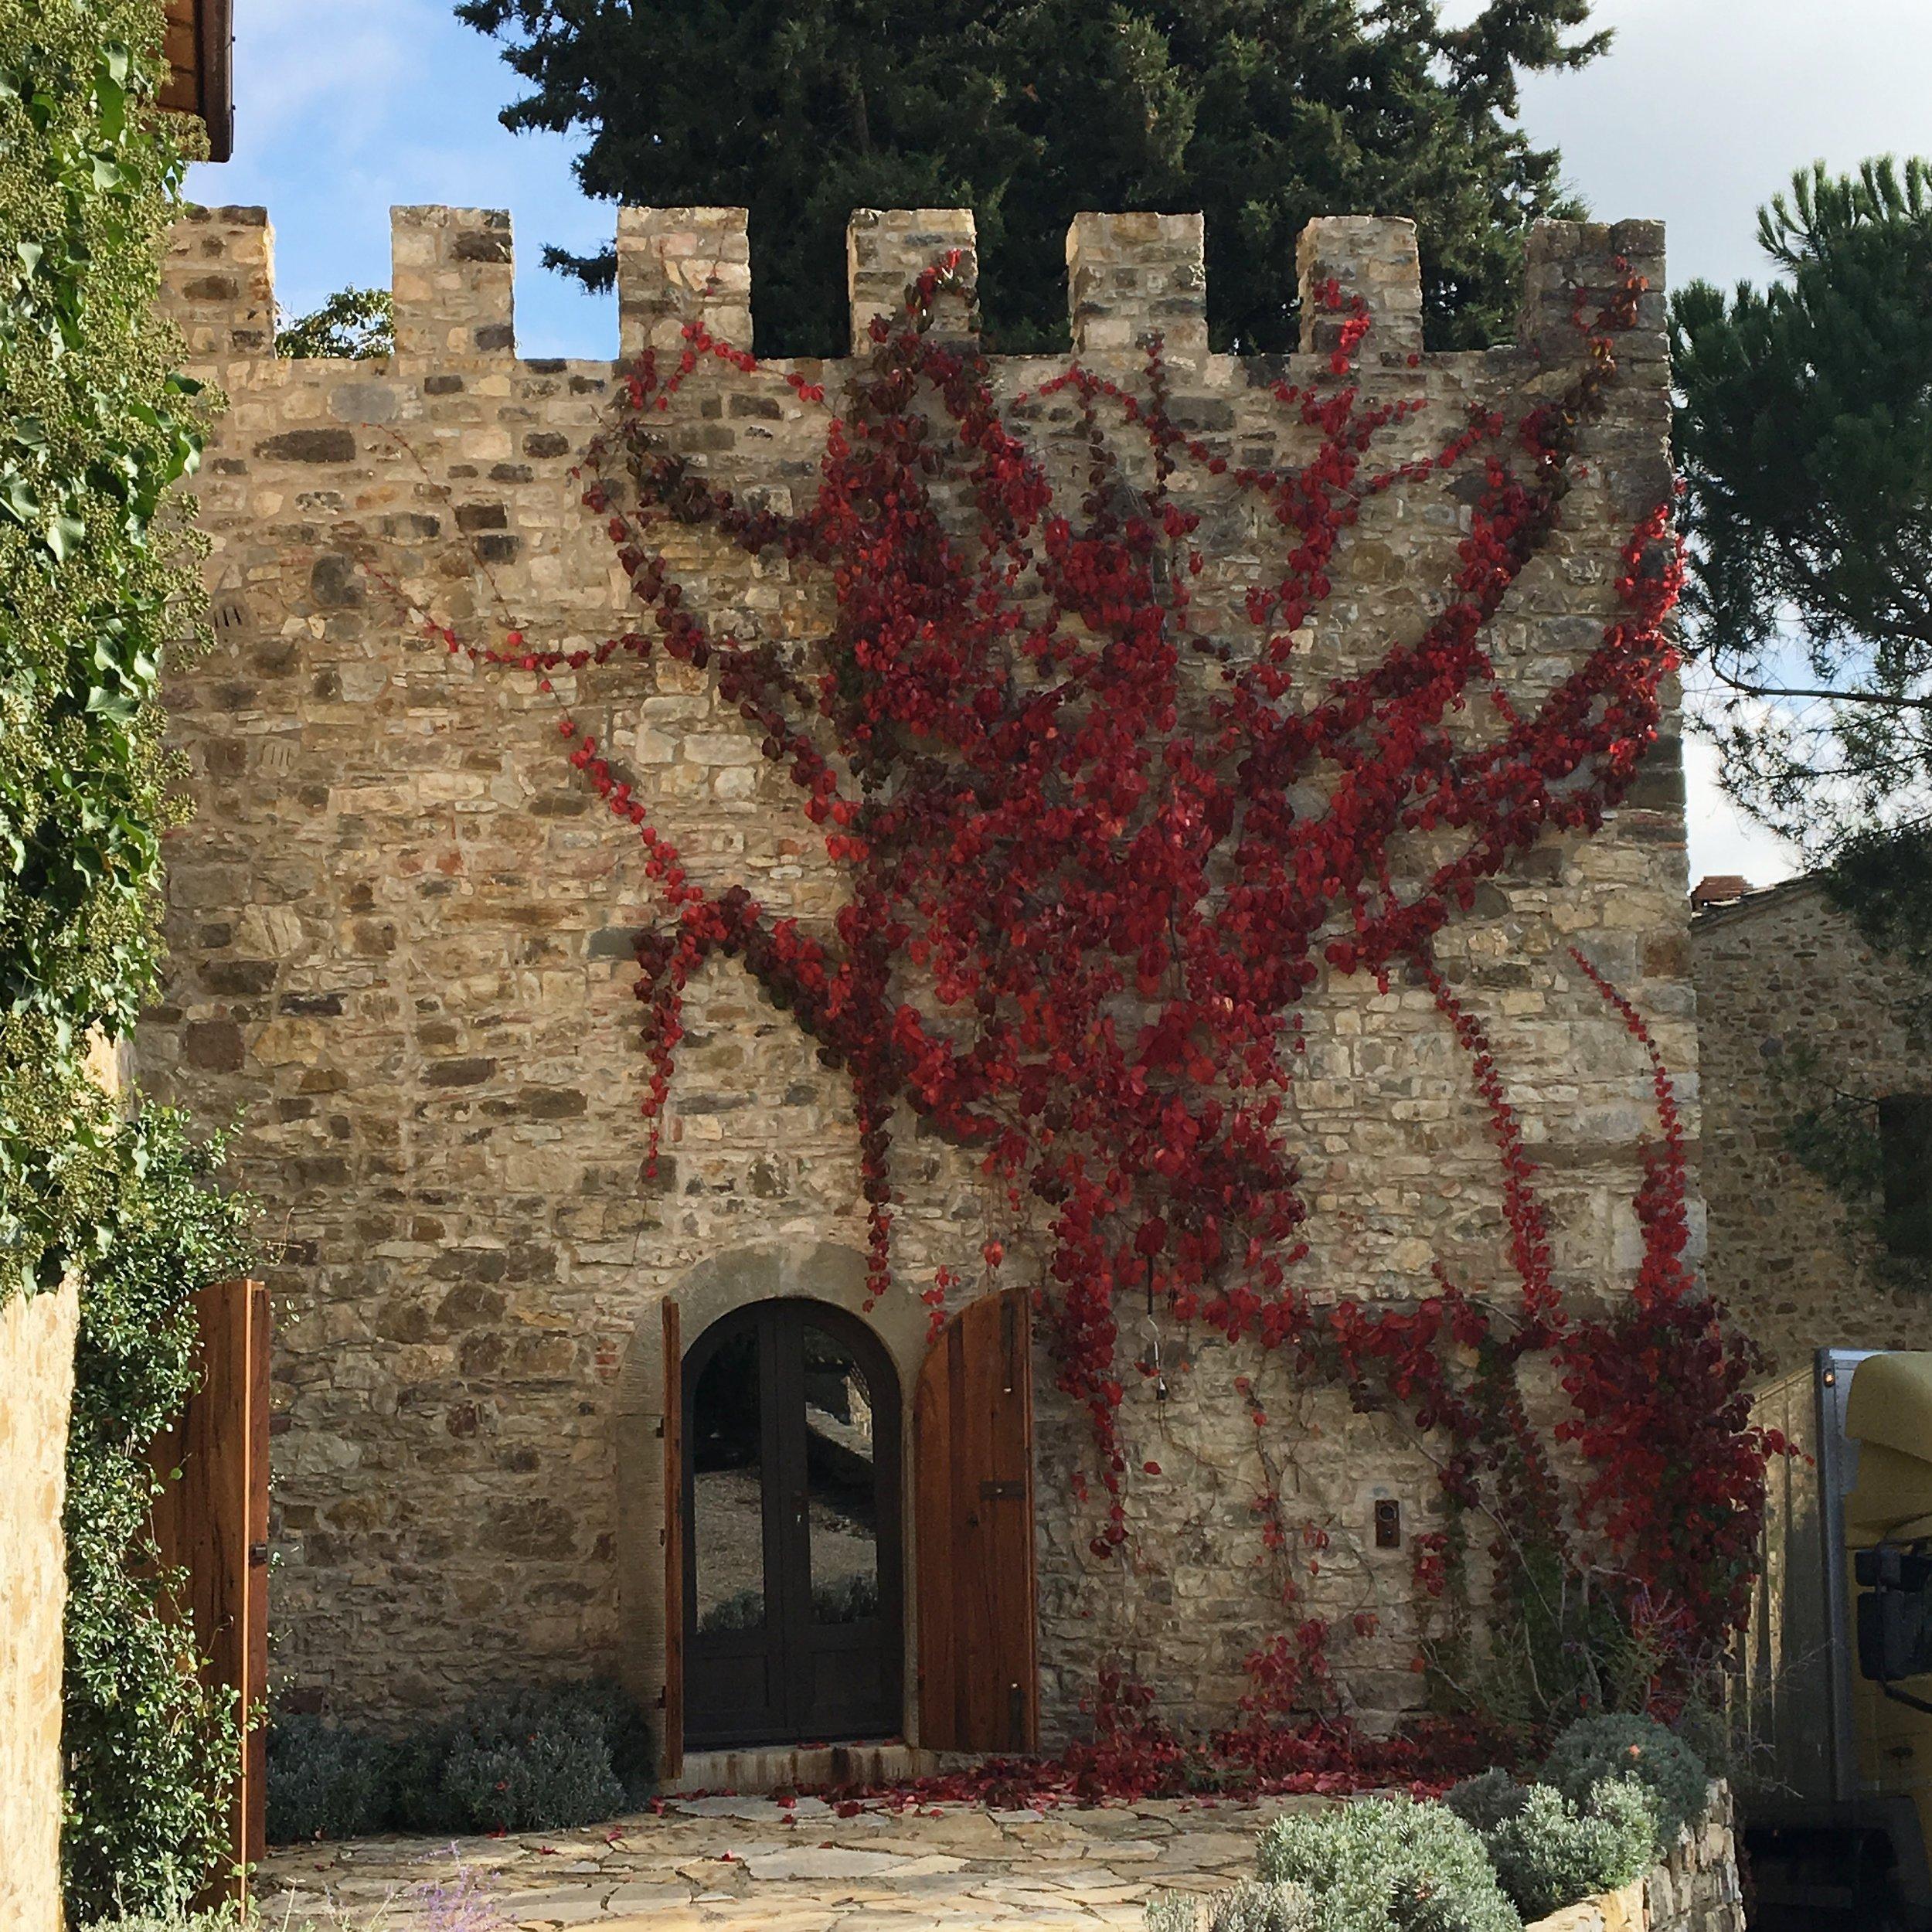 Autumn begins in Chianti